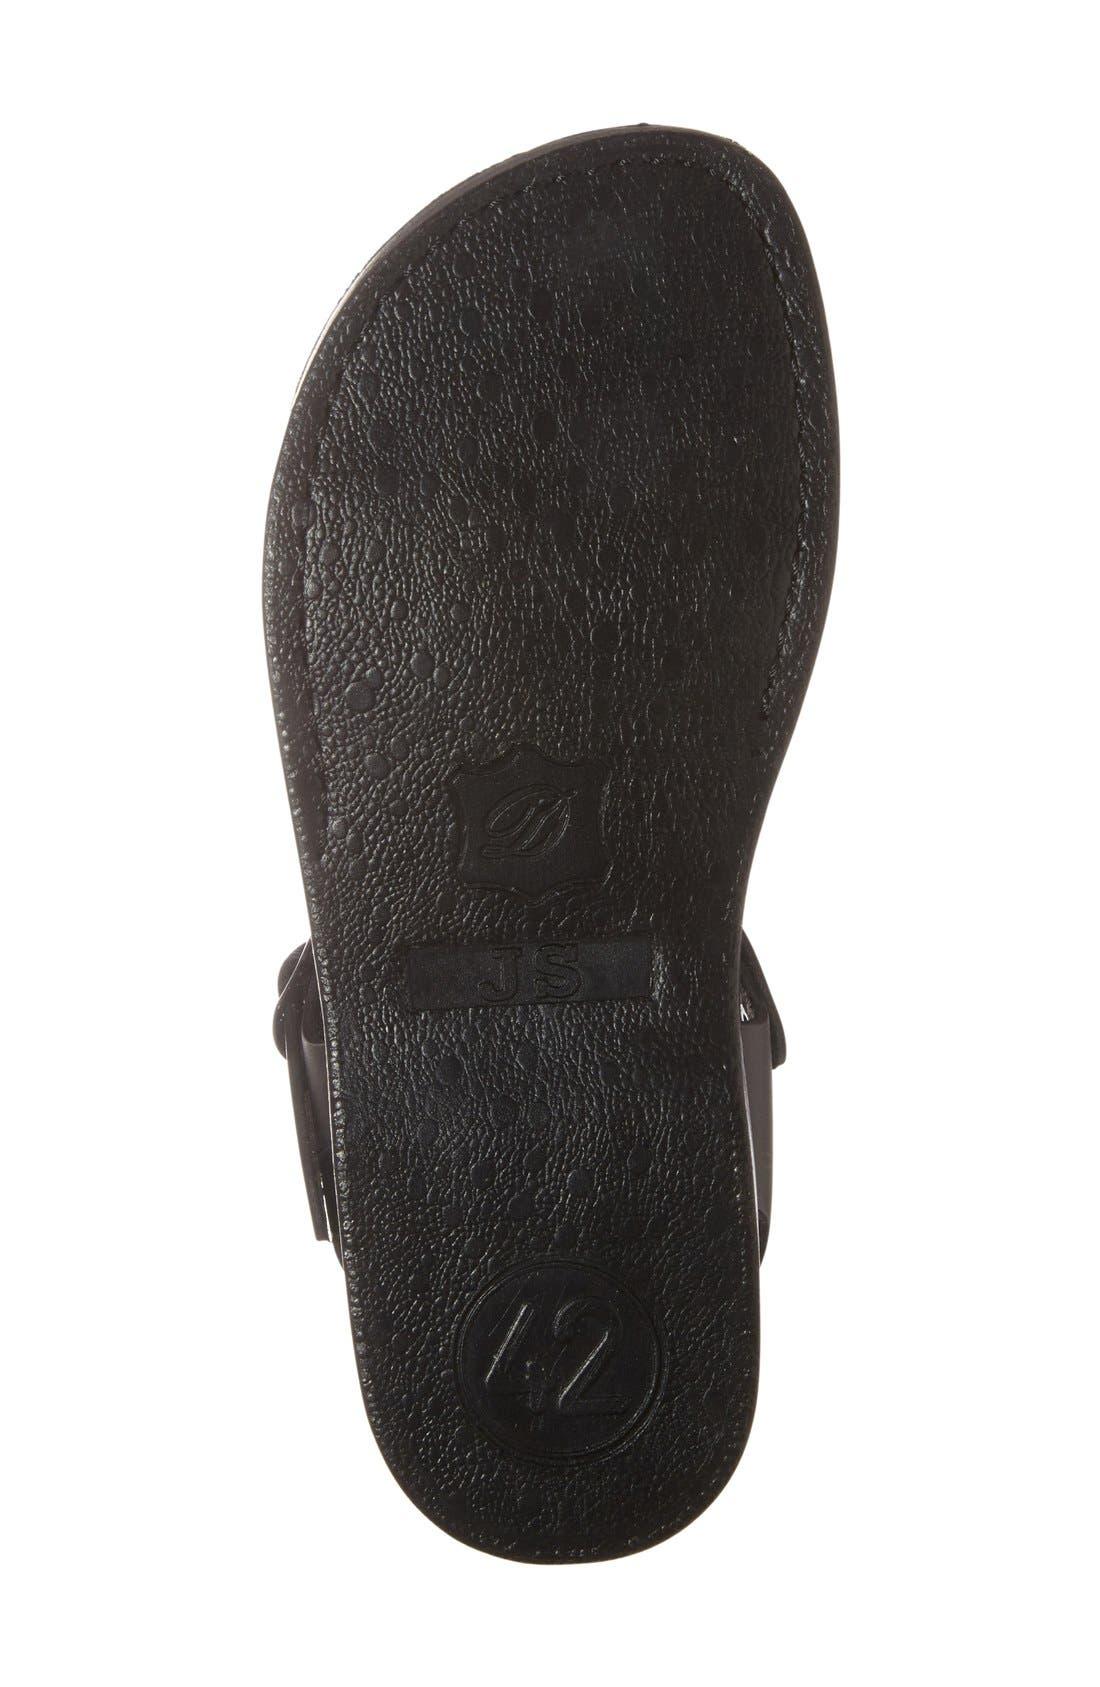 'The Original' Sandal,                             Alternate thumbnail 4, color,                             Black Leather